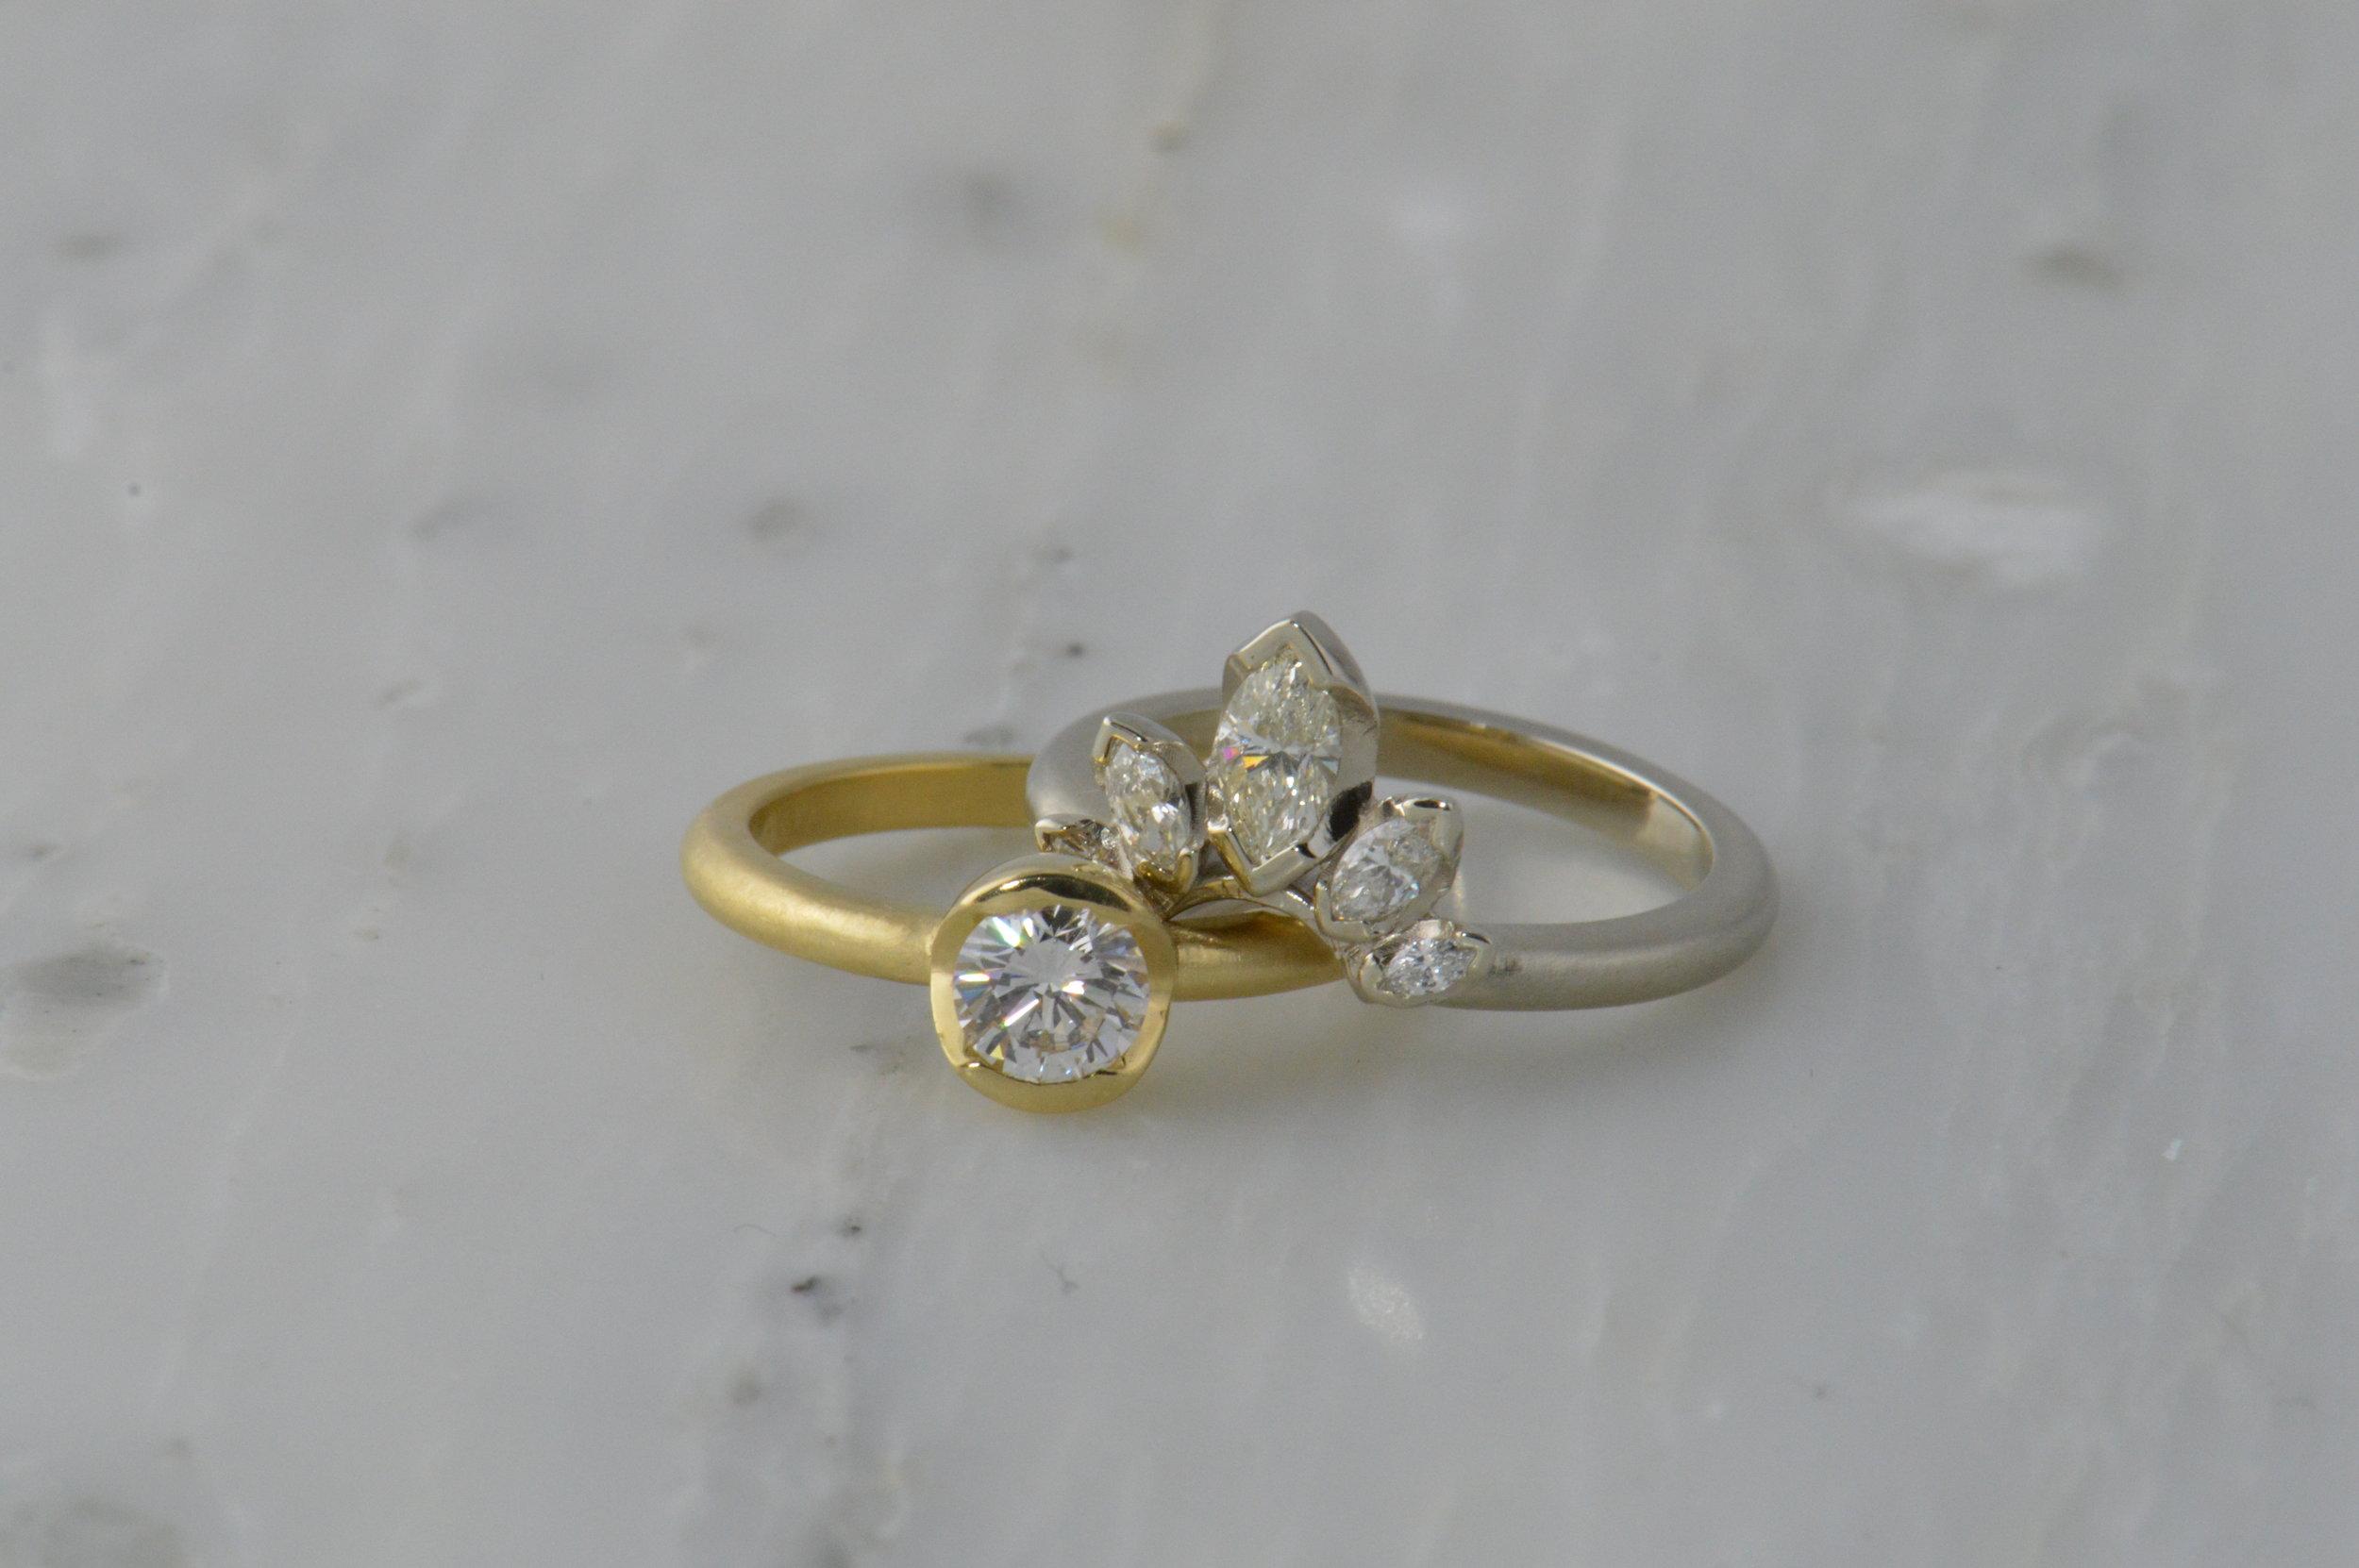 darvier-wedding-crown-ring-set.JPG